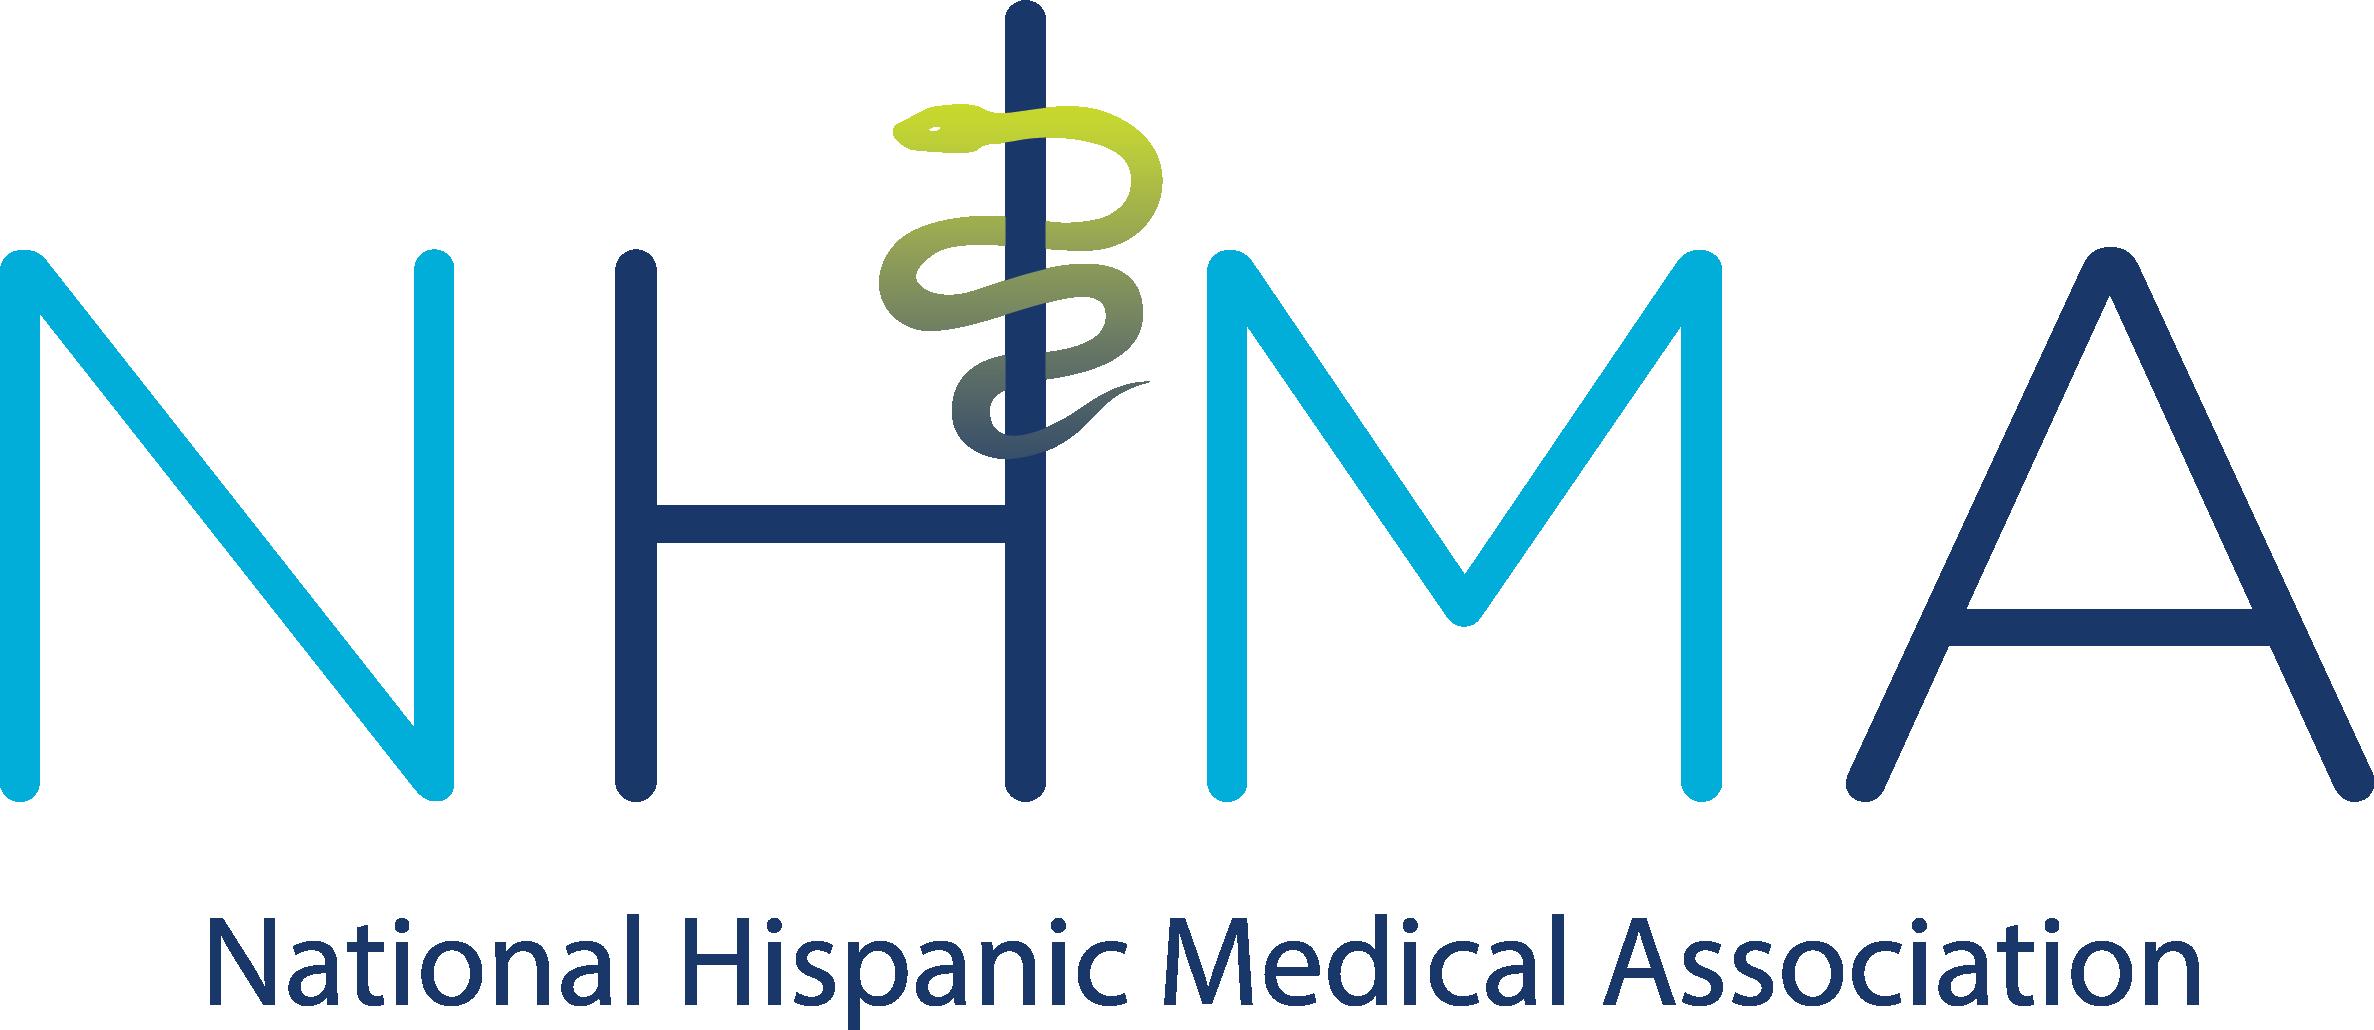 NHMA - National Hispanic Medical Association